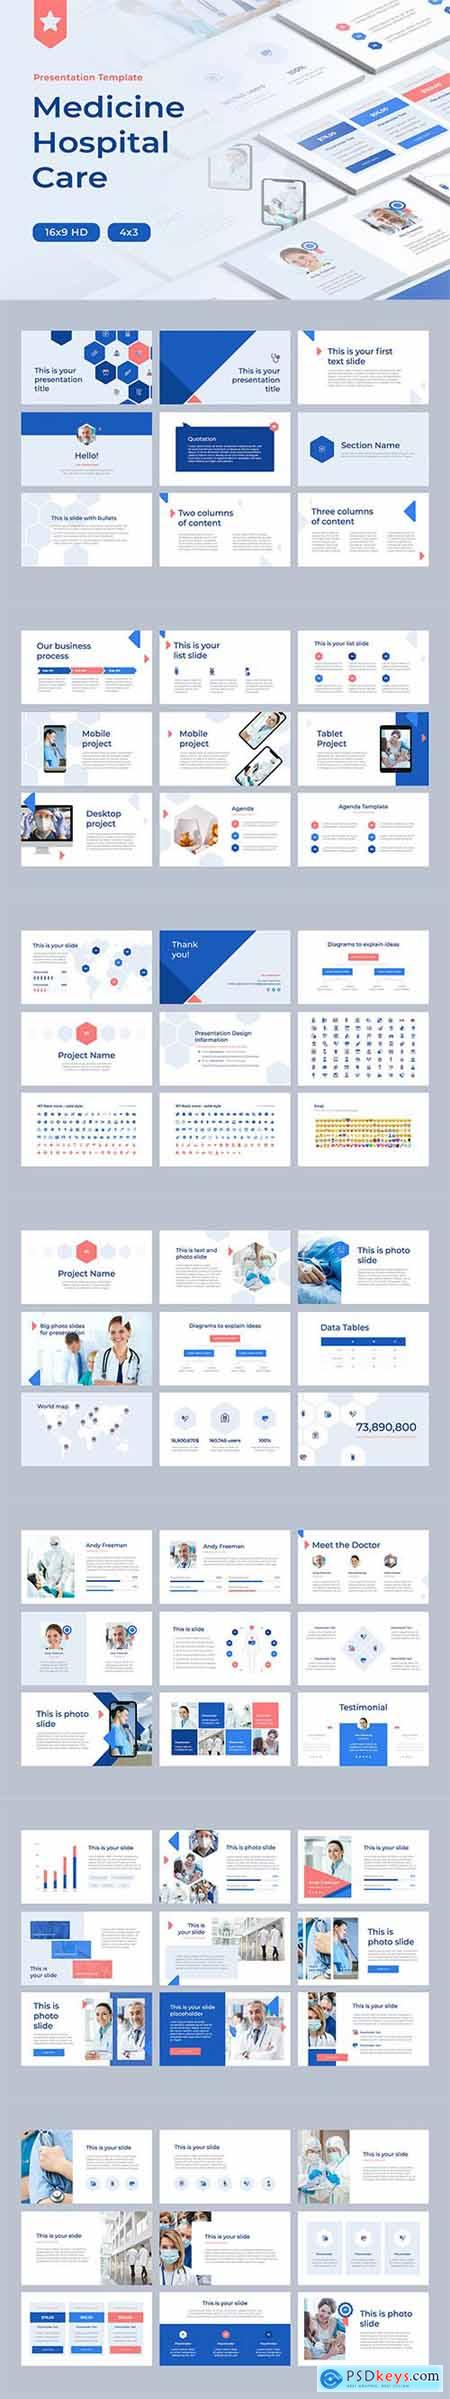 Medicine Hospital Care PowerPoint, Keynote, Google Slides Templates